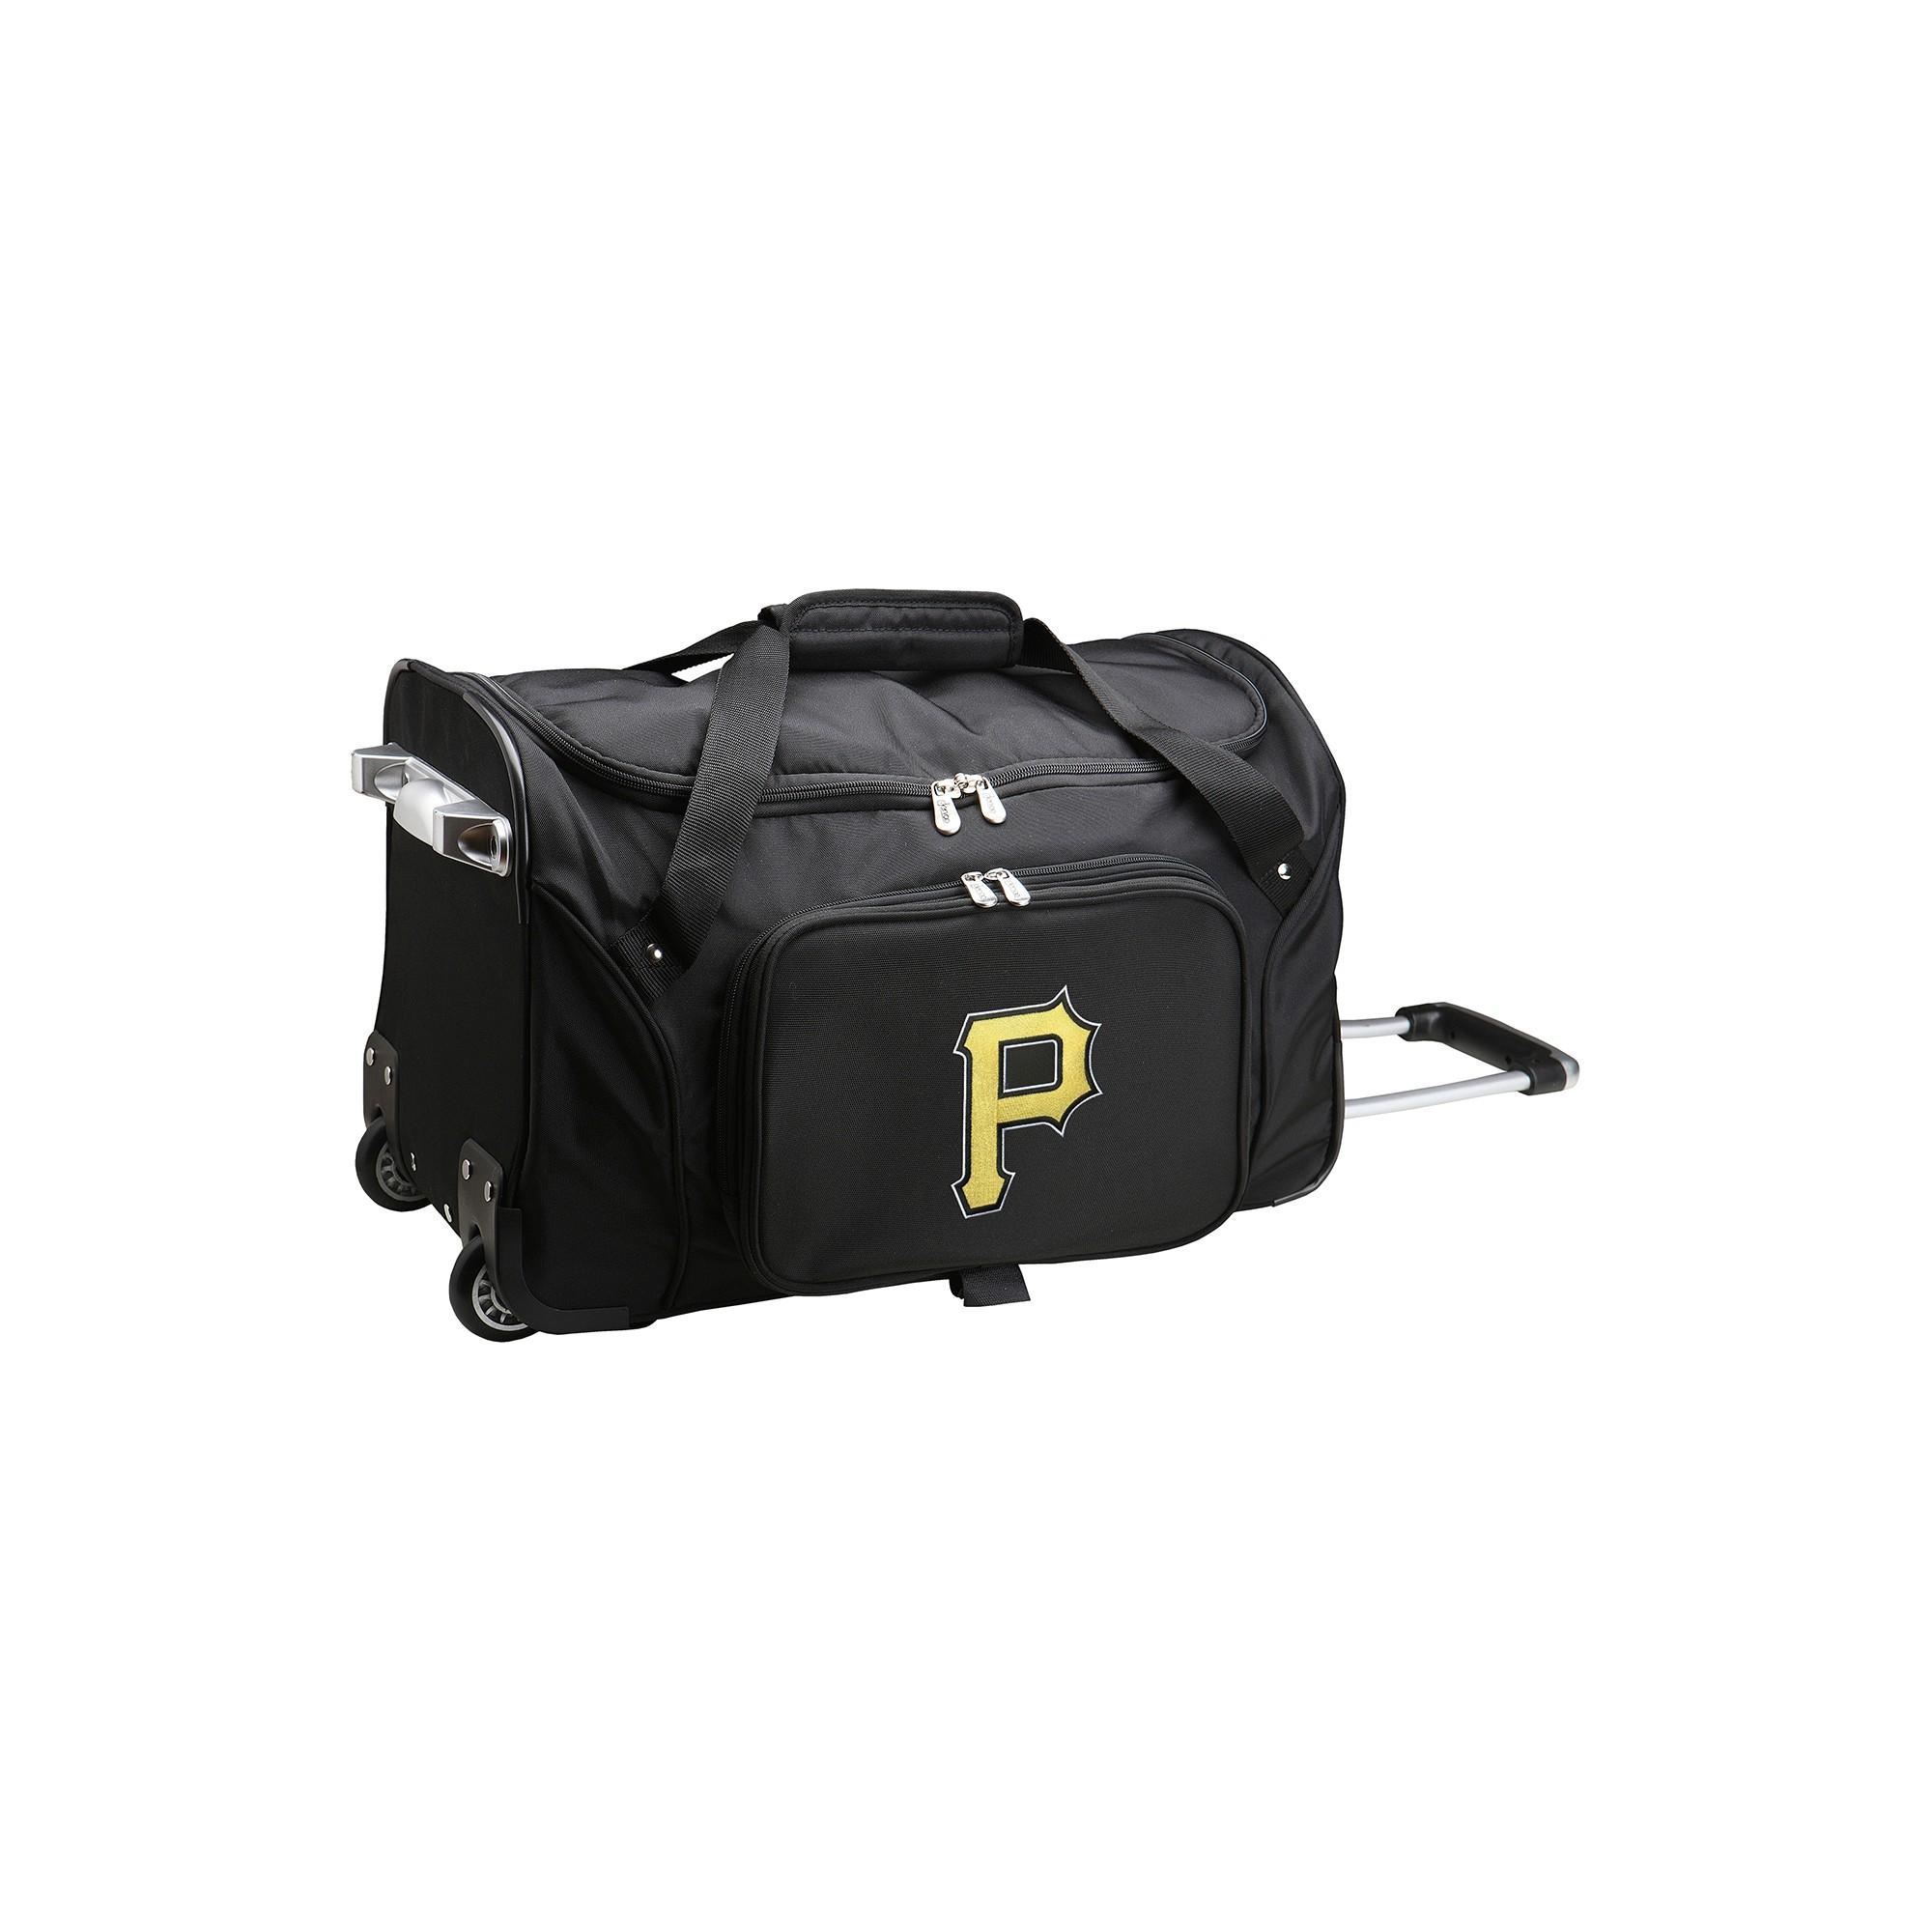 Mlb Pittsburgh Pirates 22 Rolling Duffel